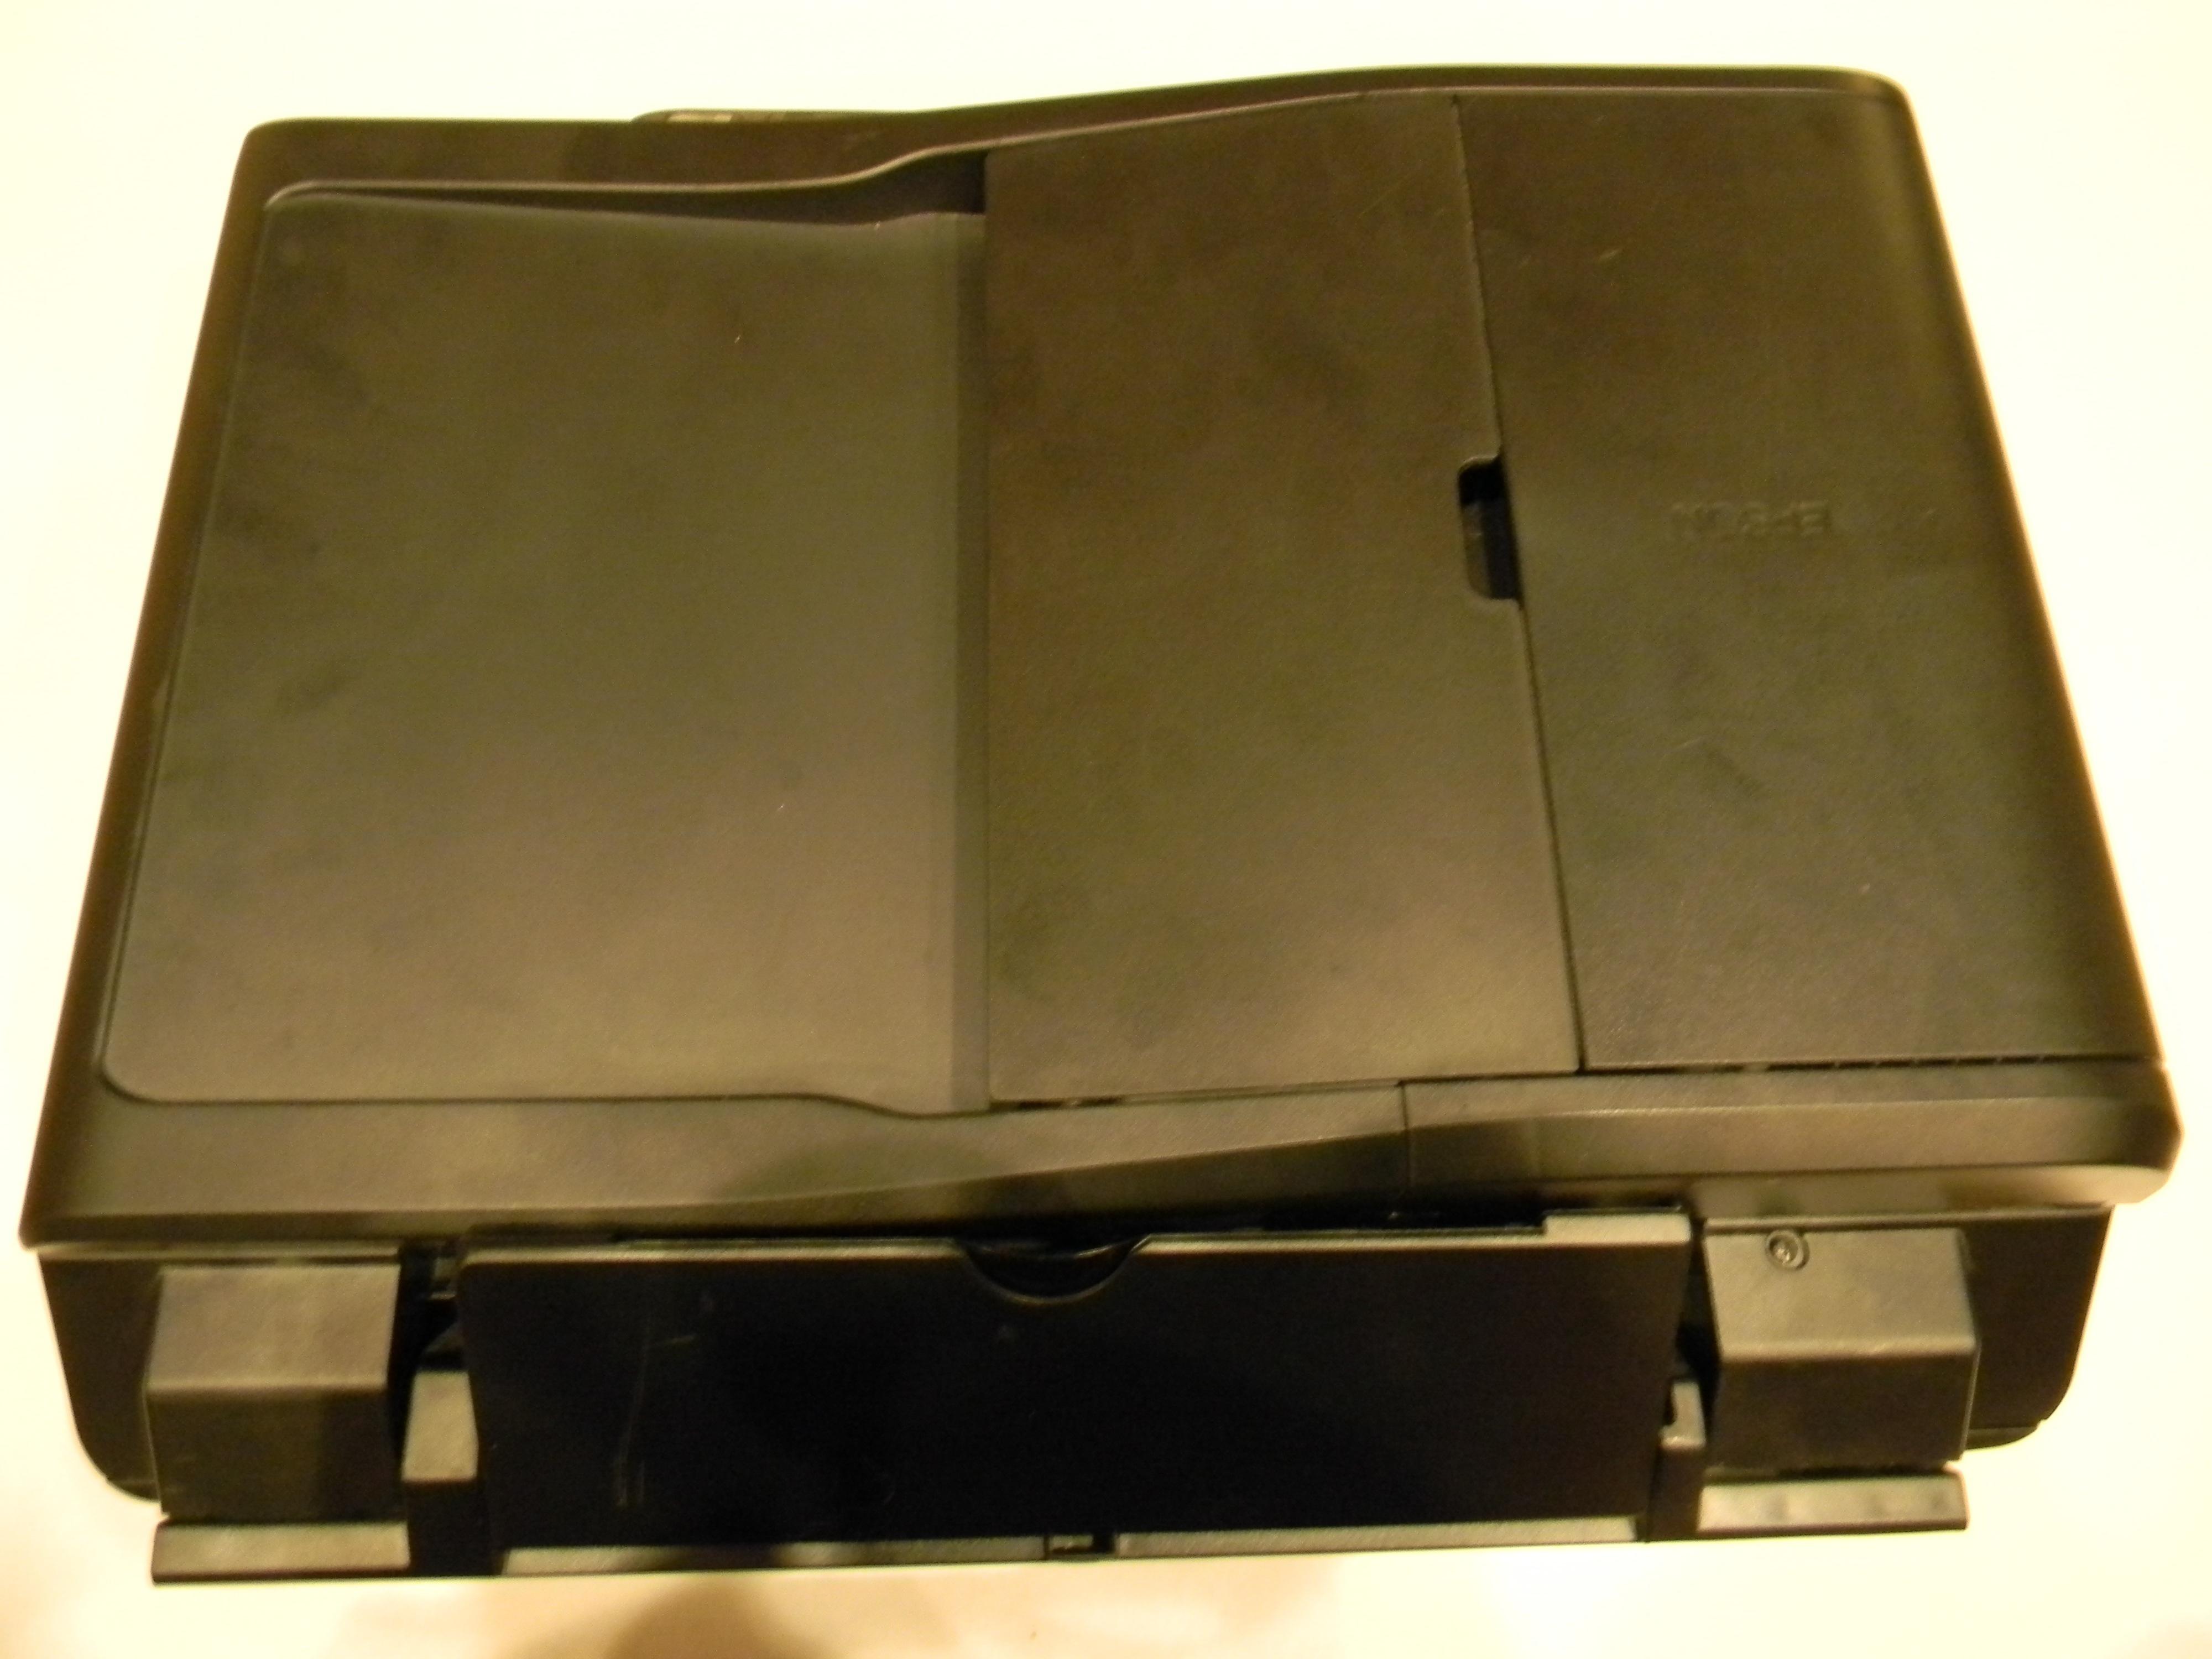 Epson Stylus NX305 Scanner Windows 7 64-BIT